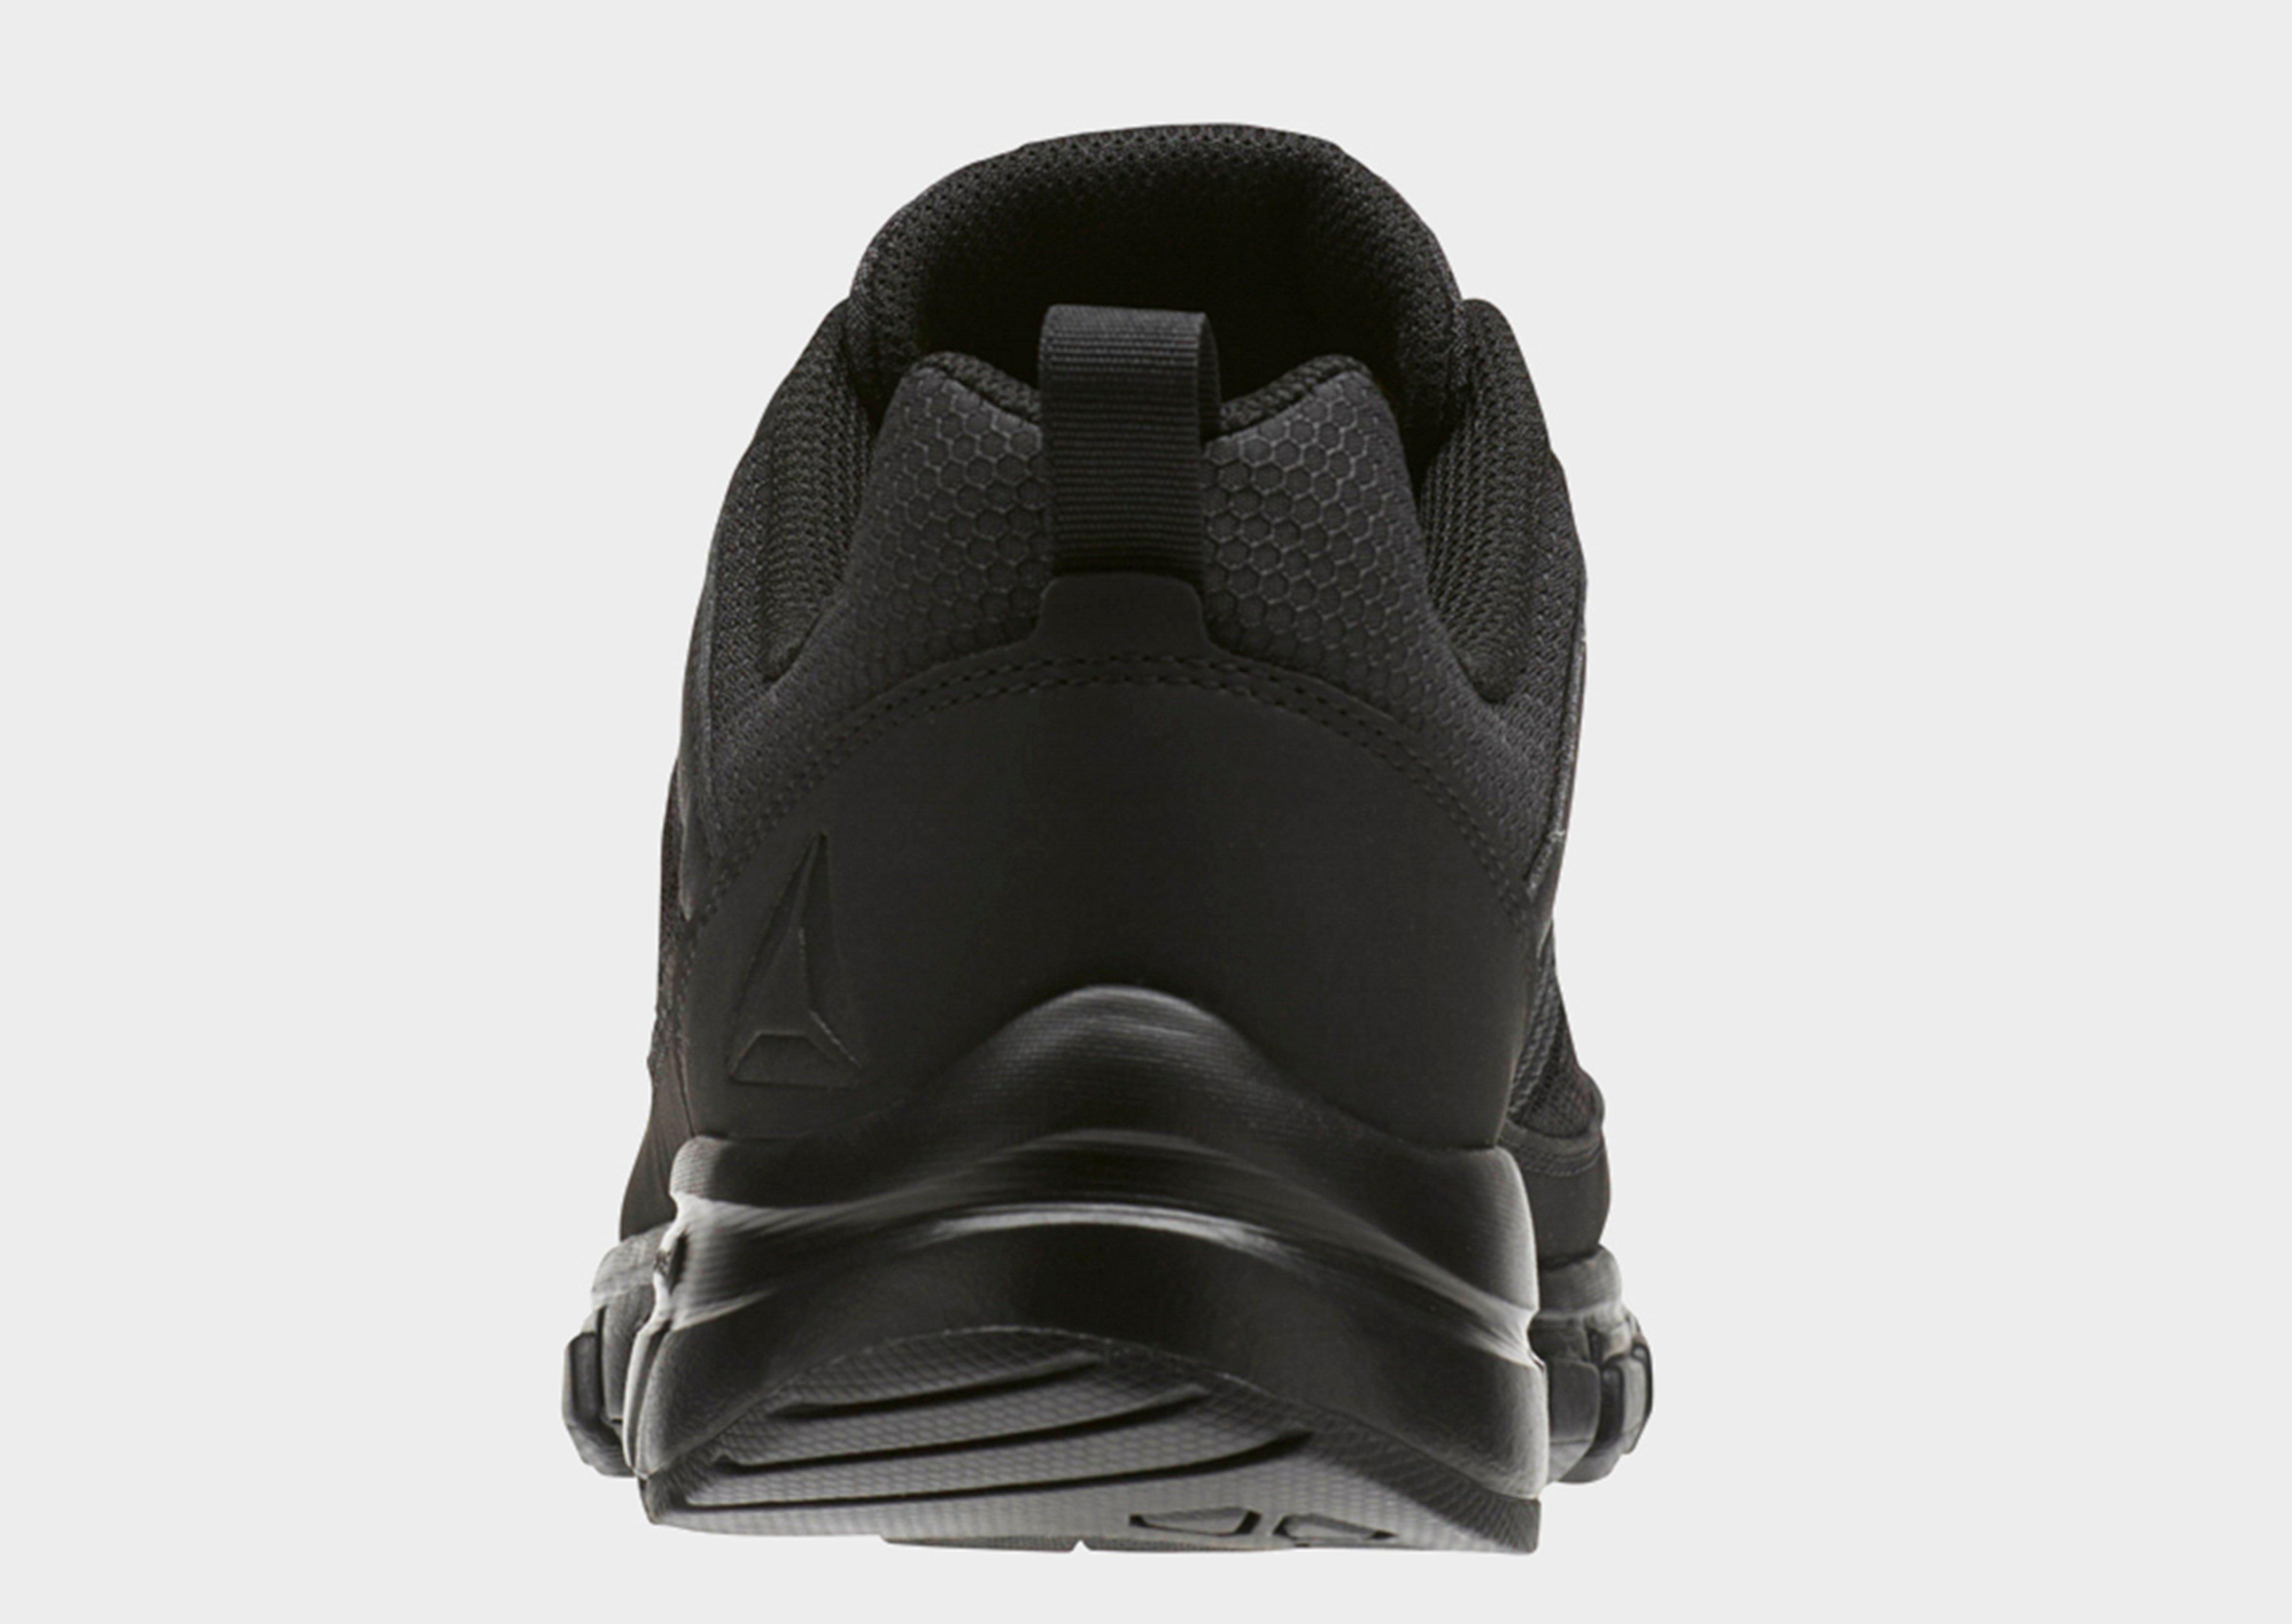 d3cc2858292 Reebok - Black Dmxride Comfort 4.0 for Men - Lyst. View fullscreen